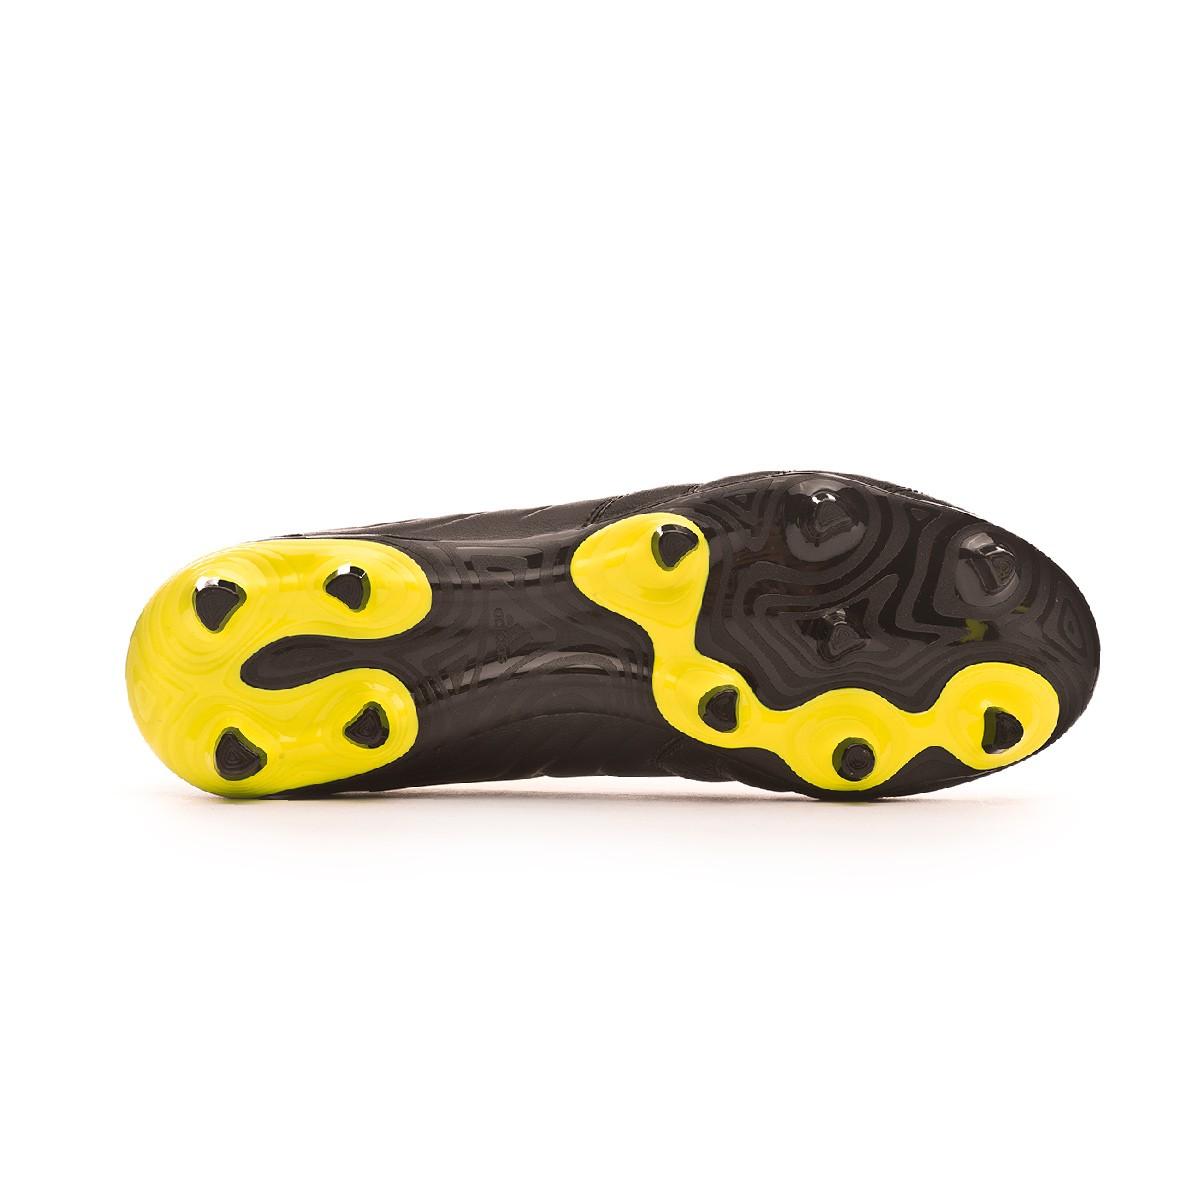 11670b21305b3 Zapatos de fútbol adidas Copa 19.3 FG Core black-Solar yellow-Core black -  Tienda de fútbol Fútbol Emotion